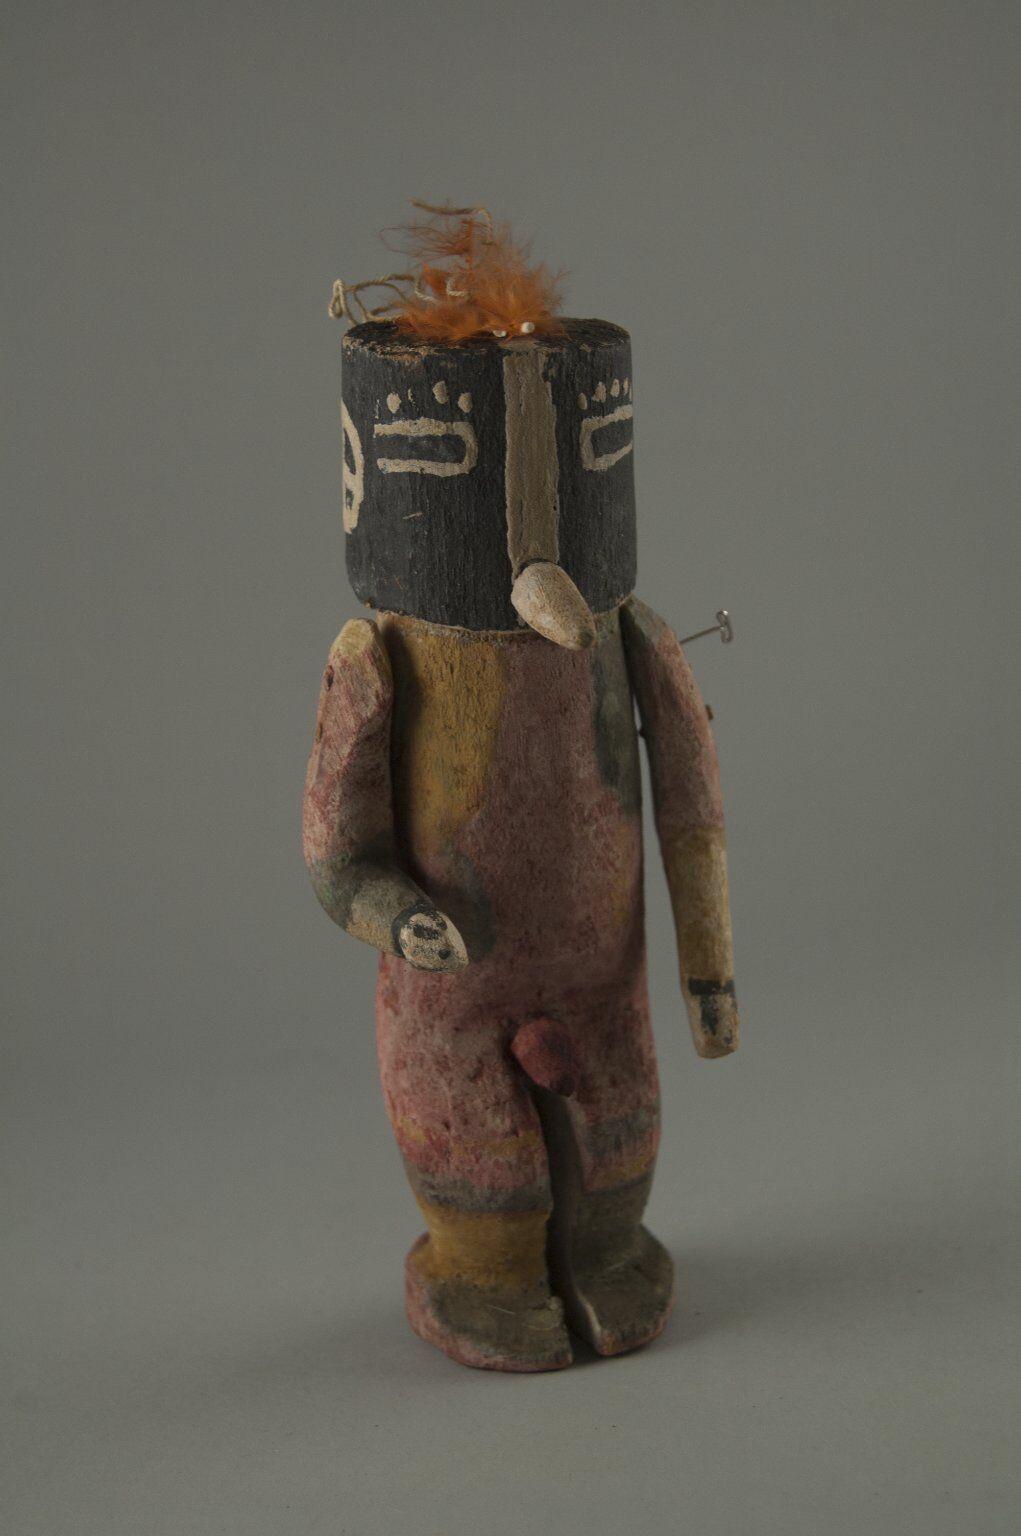 Hopi Pueblo (Native American), Kachina Doll (Kokopol, Kokopelli), late 19th century. Photo via the Brooklyn Museum.